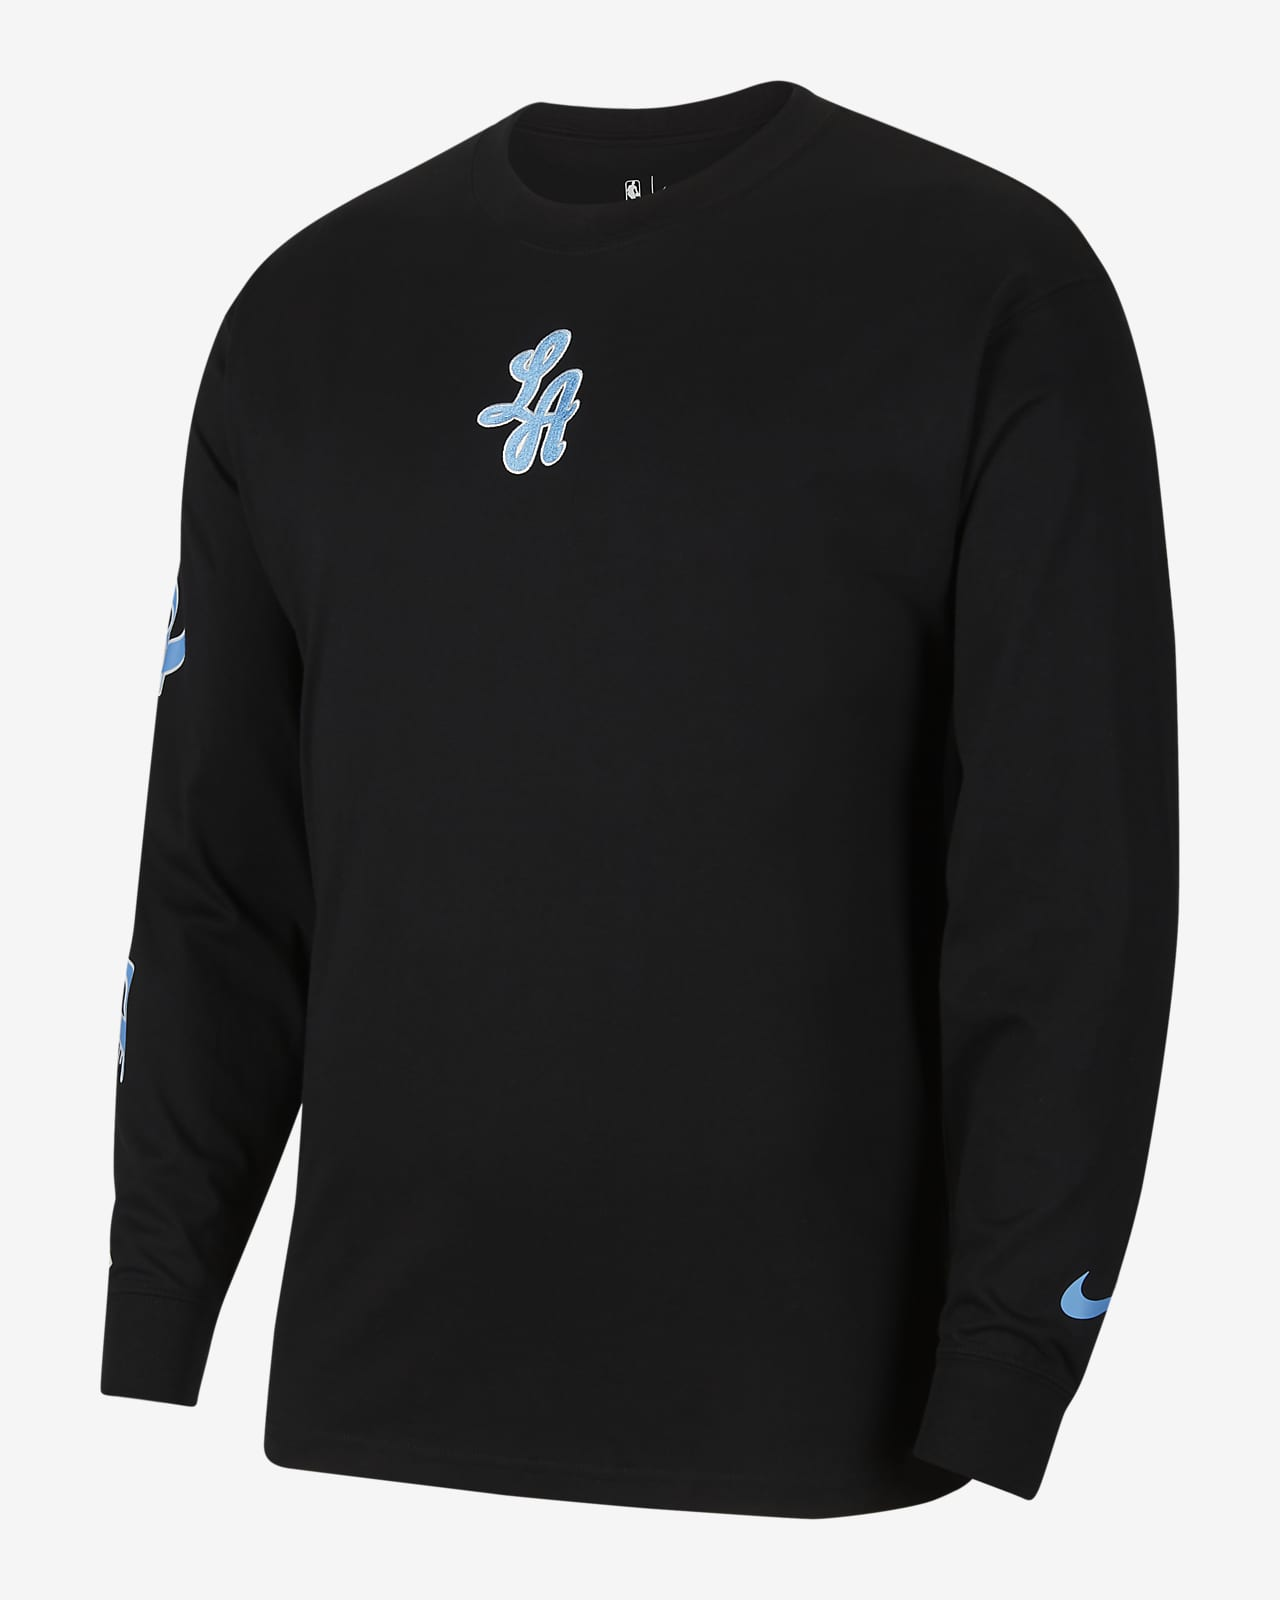 Los Angeles Lakers Courtside City Edition Men's Nike NBA T-Shirt